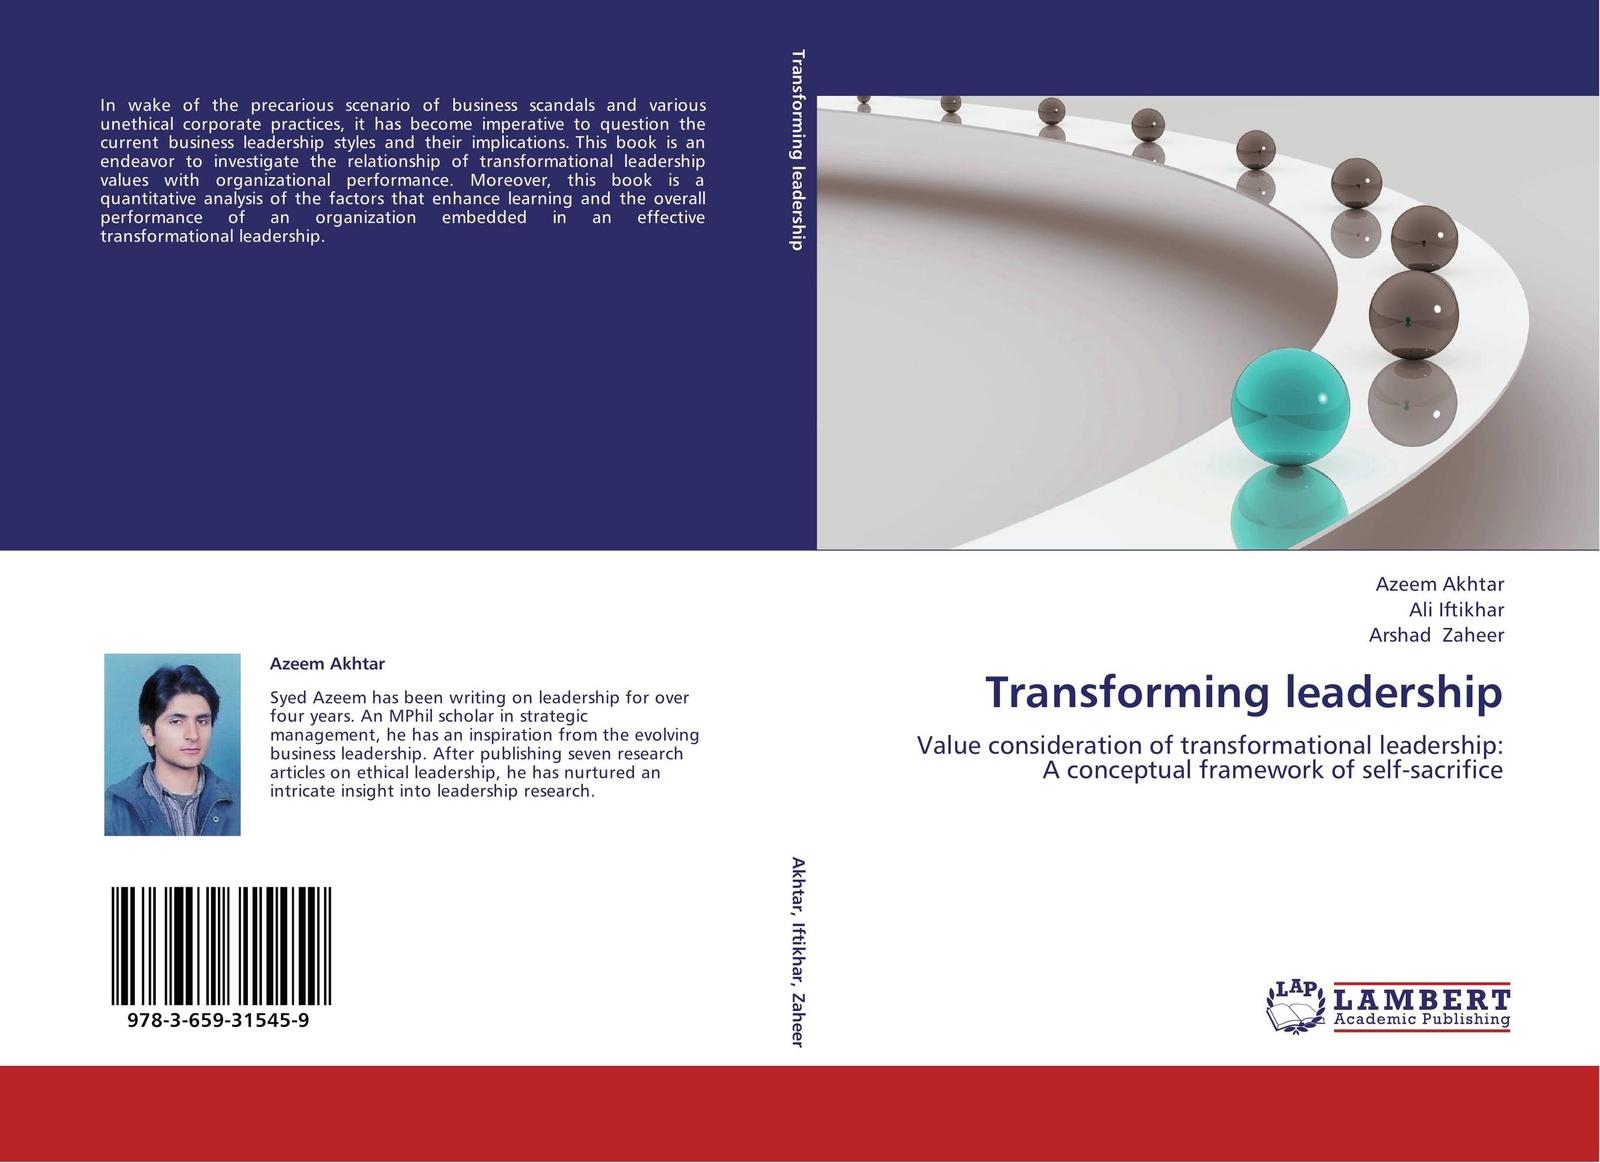 Azeem Akhtar,Ali Iftikhar and Arshad Zaheer Transforming leadership leadership a gateway to organizational performance